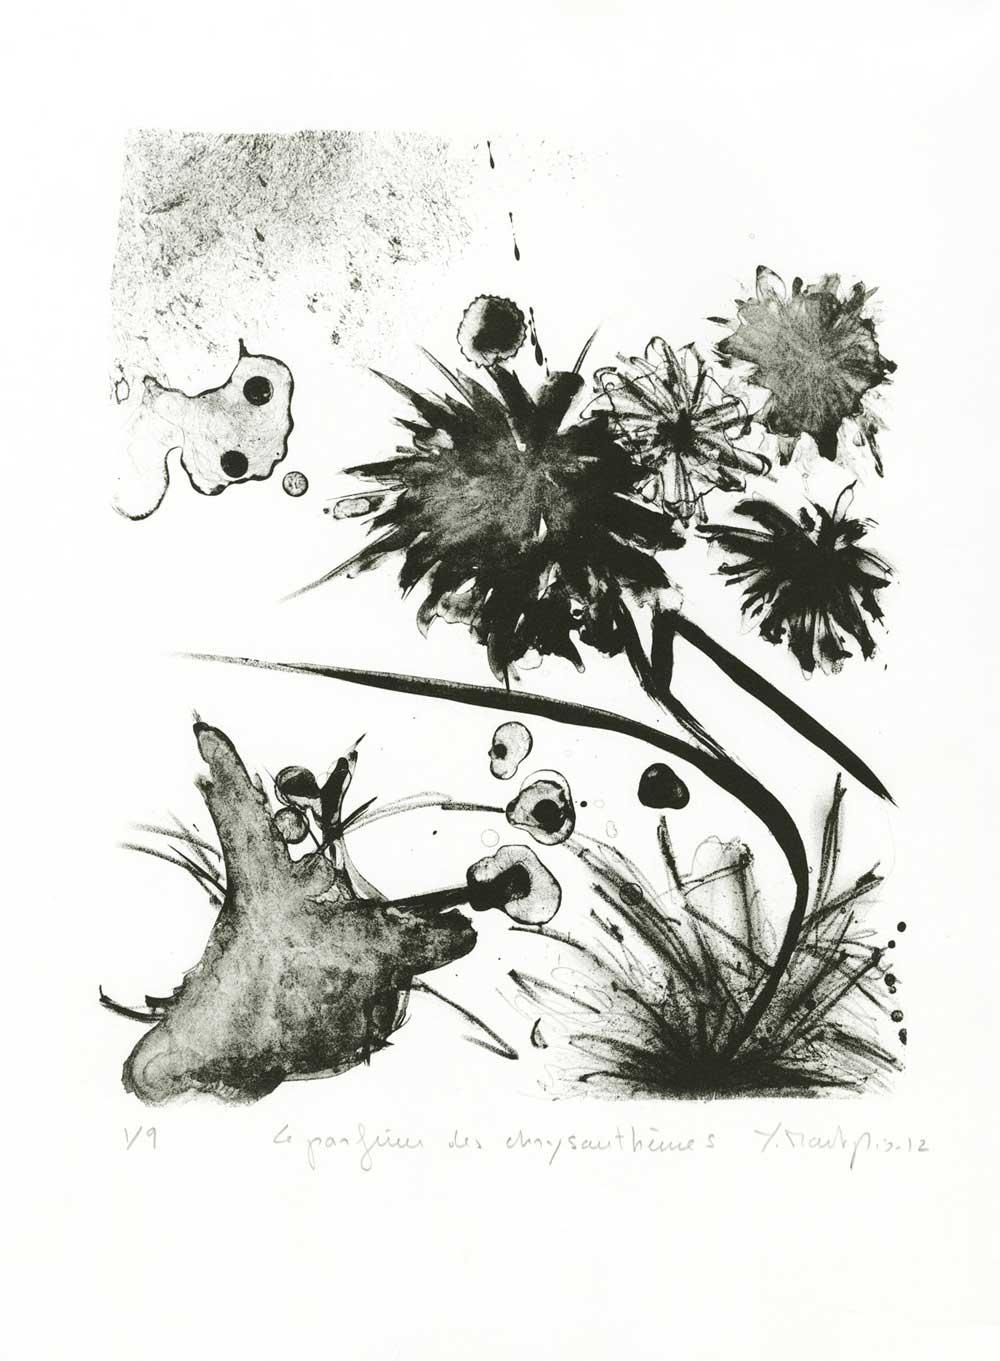 Litho_parfumchrysanthemes_2012.jpg